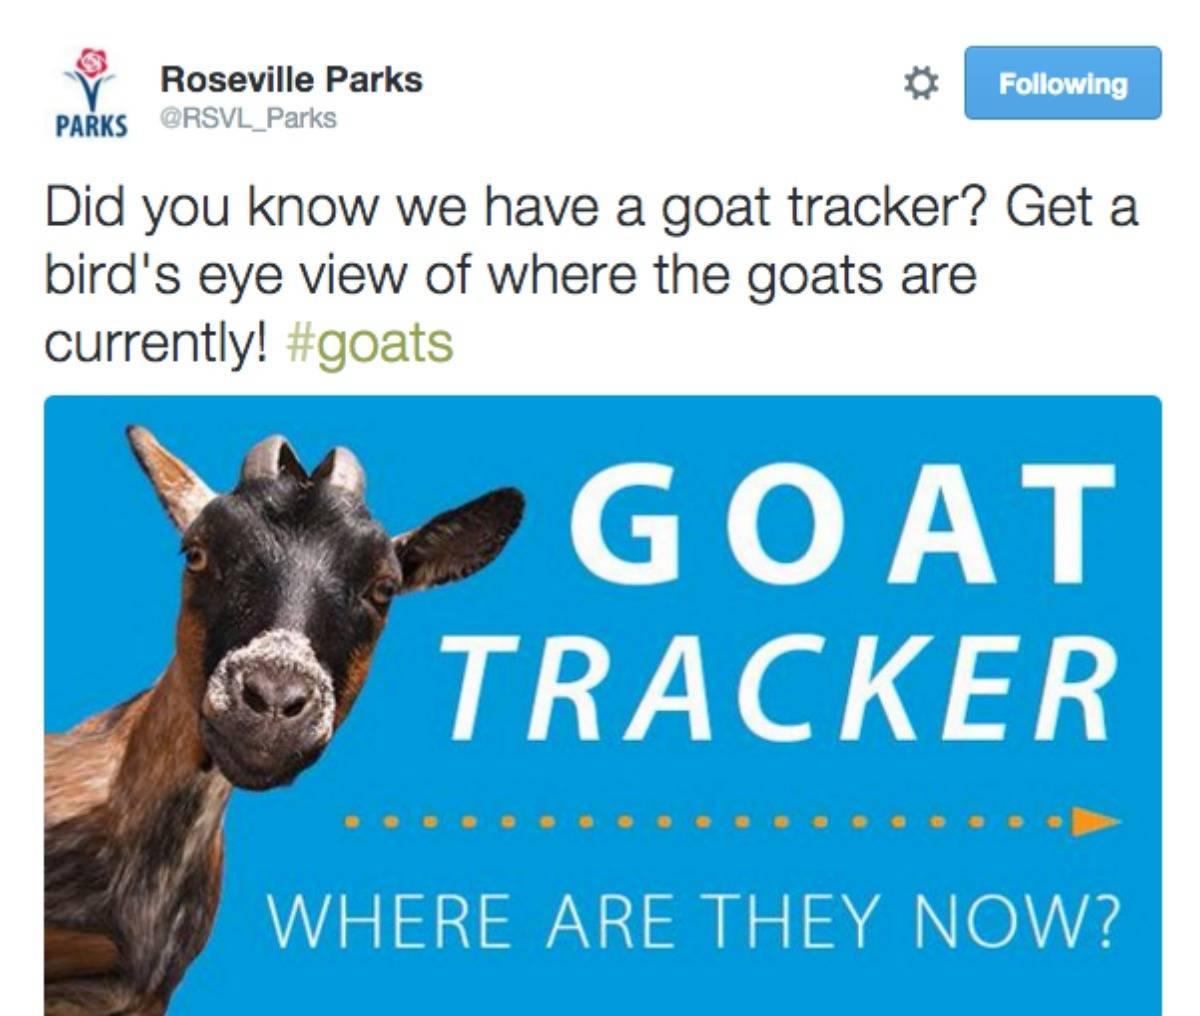 Real estate Agent Blogger Kaye Swain shares Roseville CA Parks tweet about Roseville goats tracker